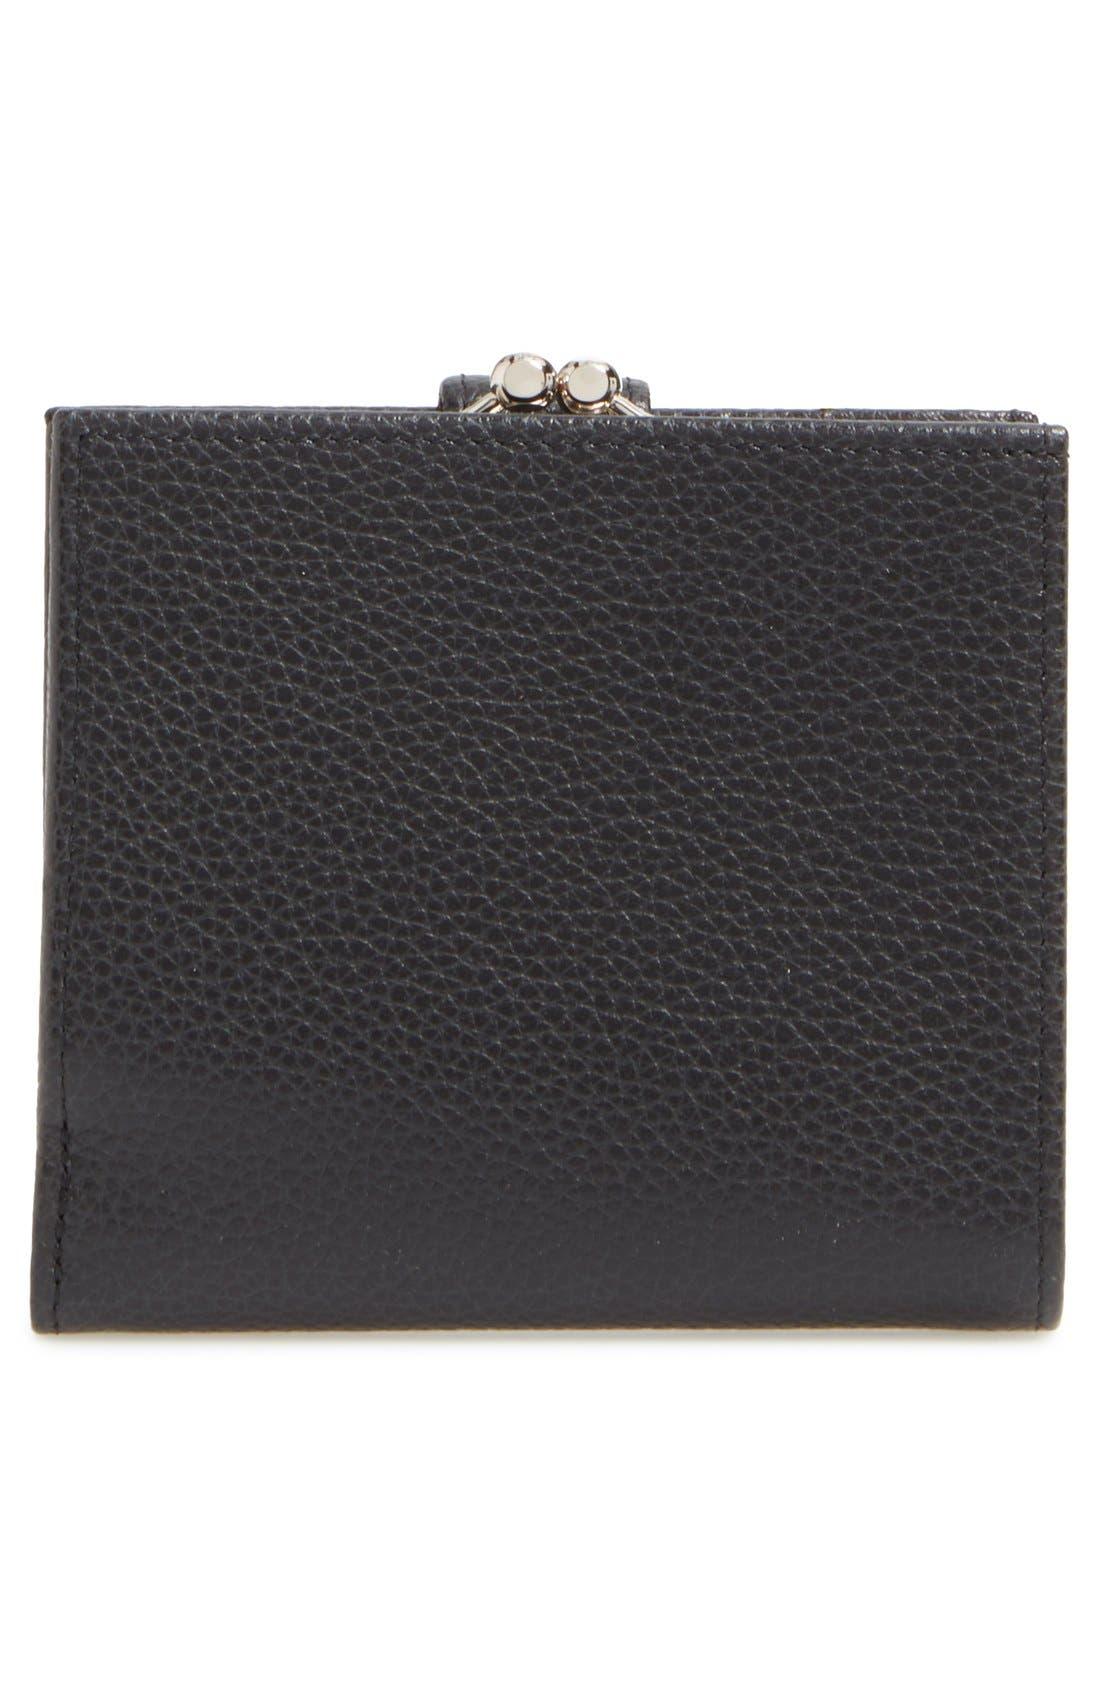 Alternate Image 2  - Longchamp 'Le Foulonne' Pebbled Leather Wallet